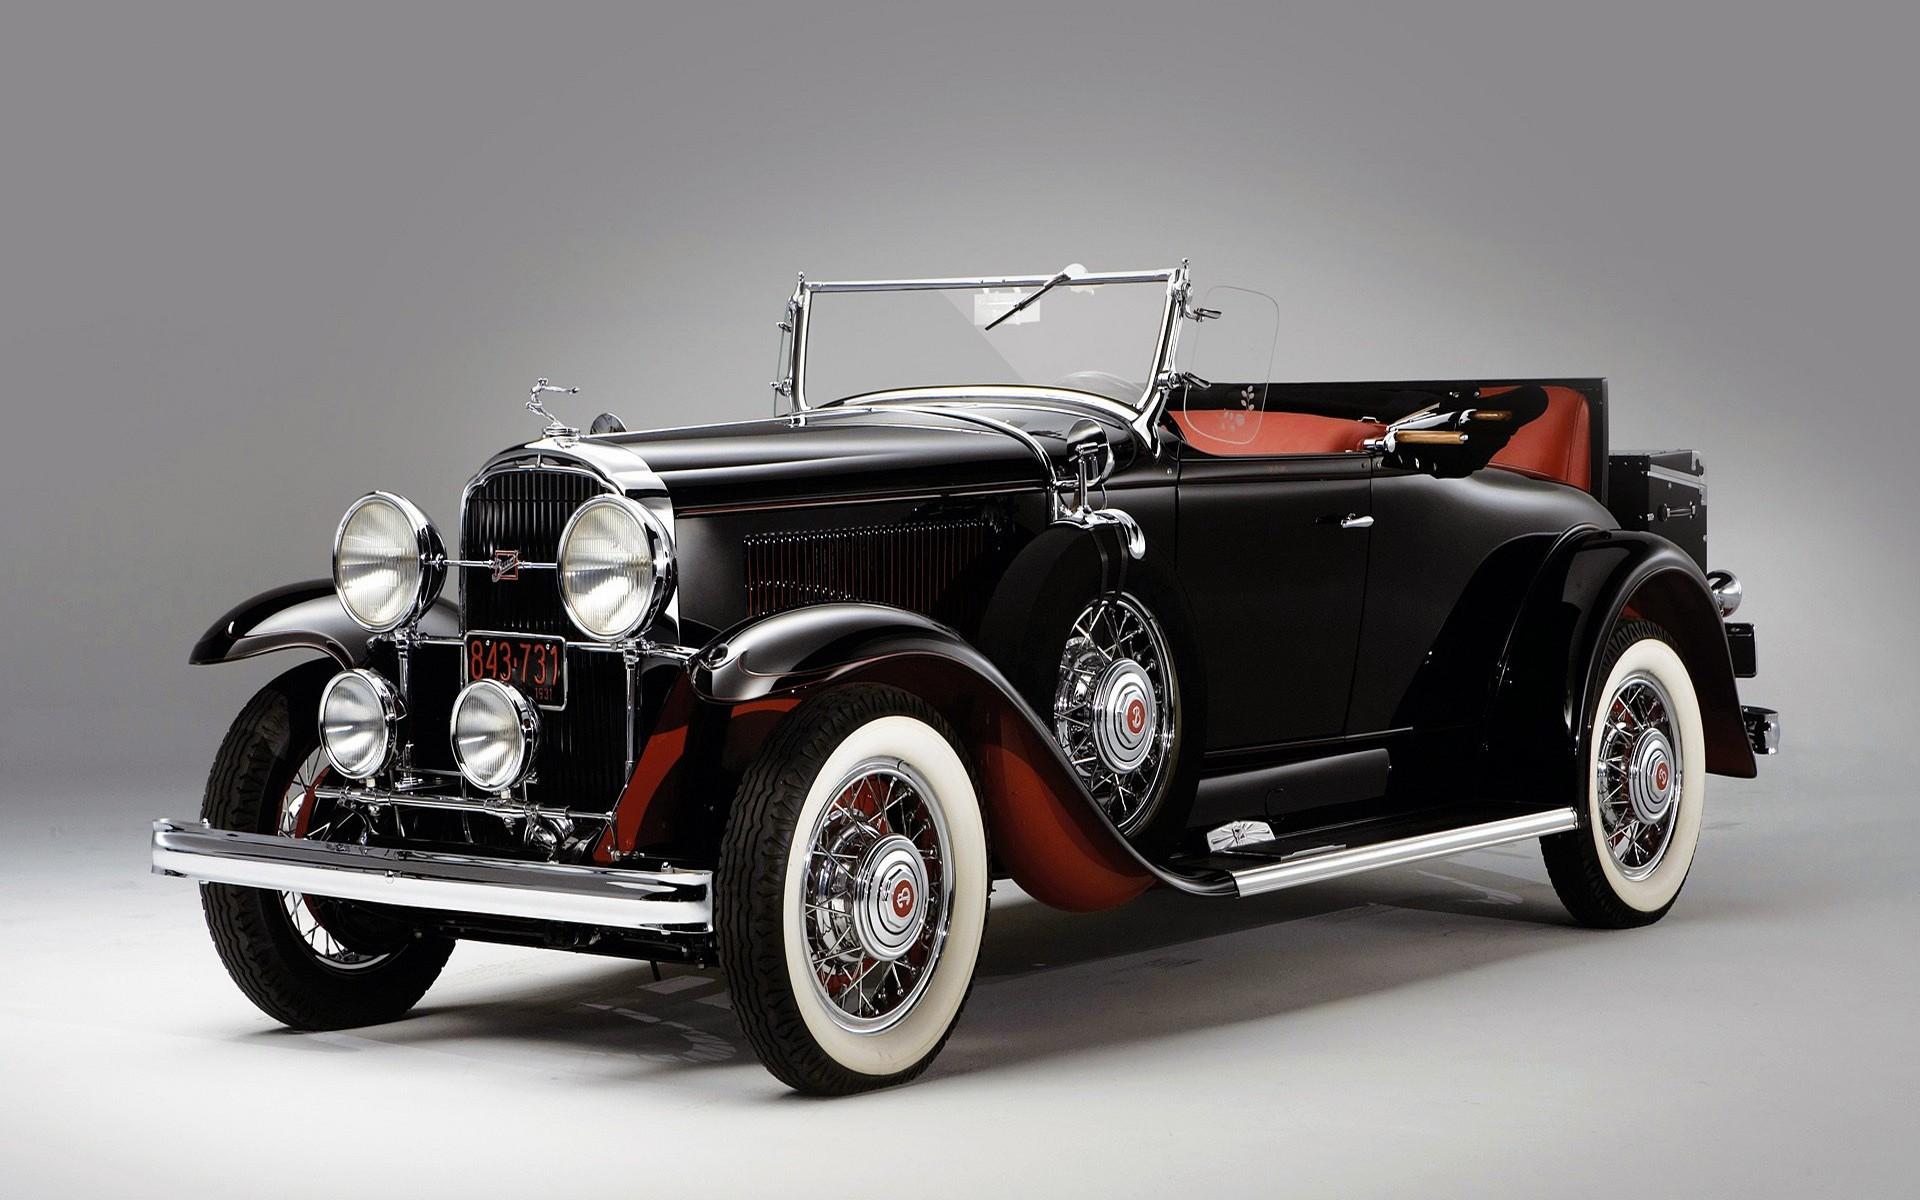 Classic Antique Vintage 4k Uhd Car Wallpaper: デスクトップ壁紙 : 車両, ビンテージ, ヴィンテージカー, クラシックカー, 1931年ビュイック